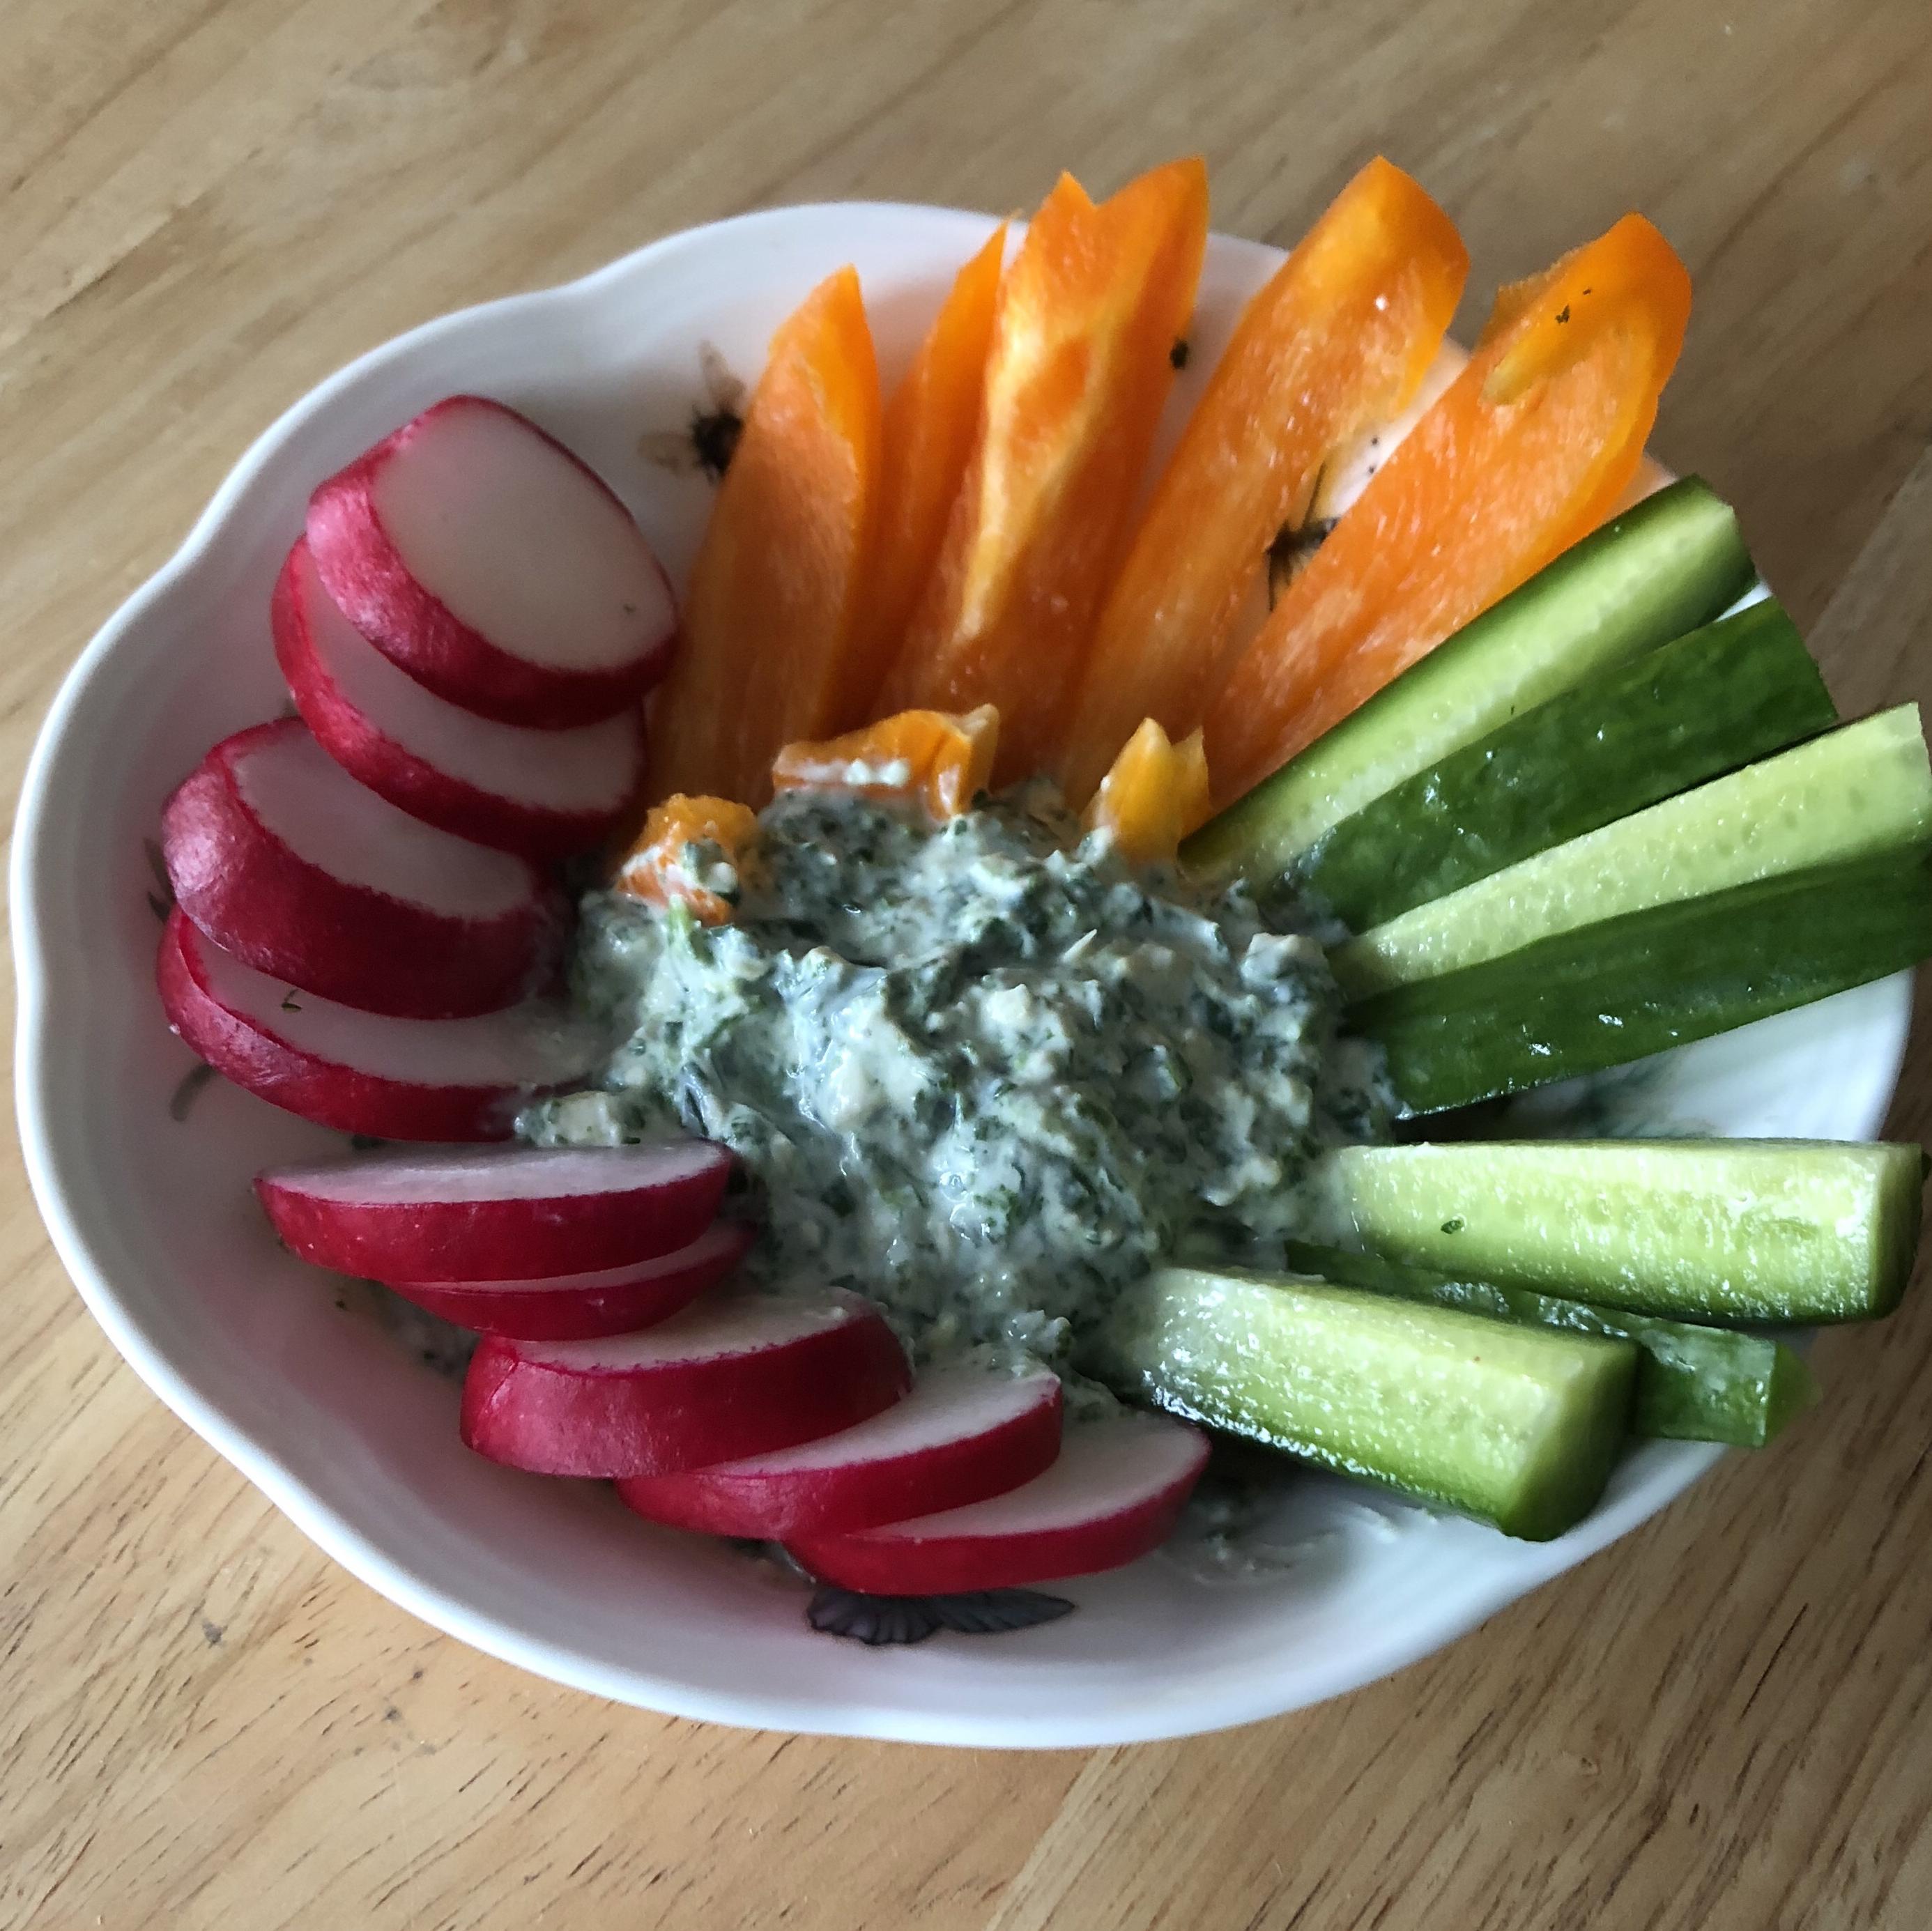 Spinach and Artichoke Greek Yogurt Dip